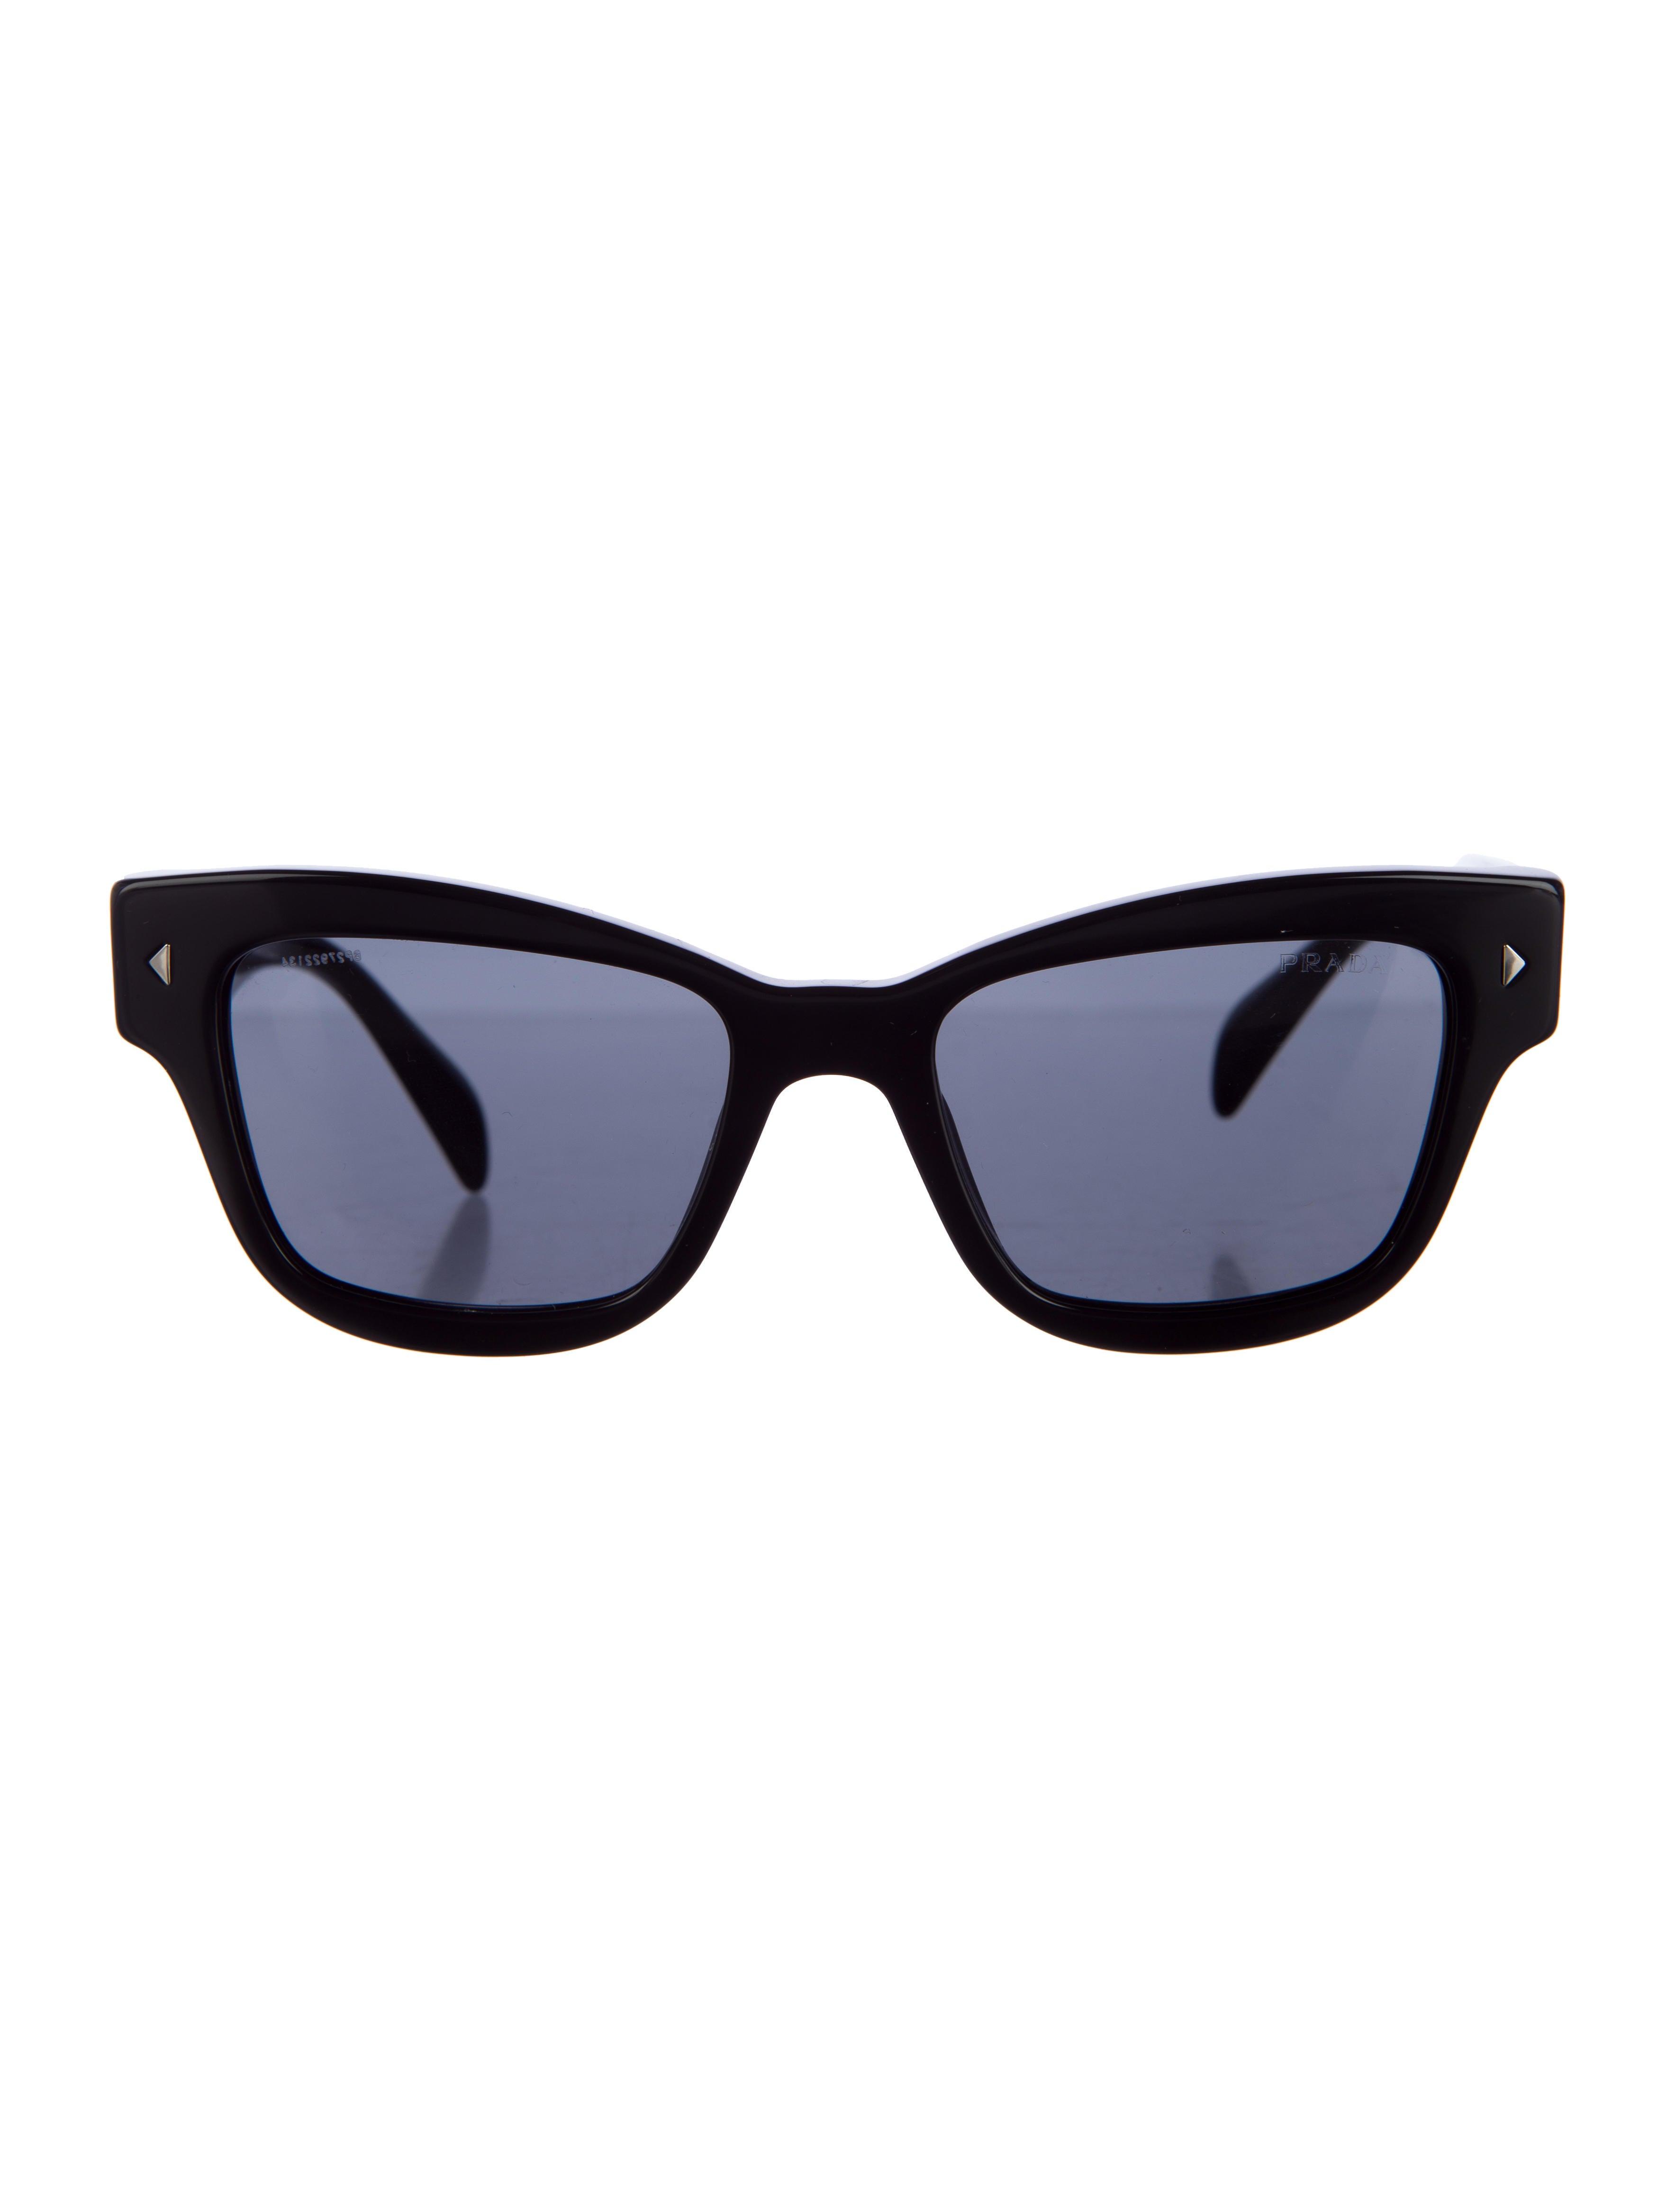 prada tinted wayfarer sunglasses accessories pra100246